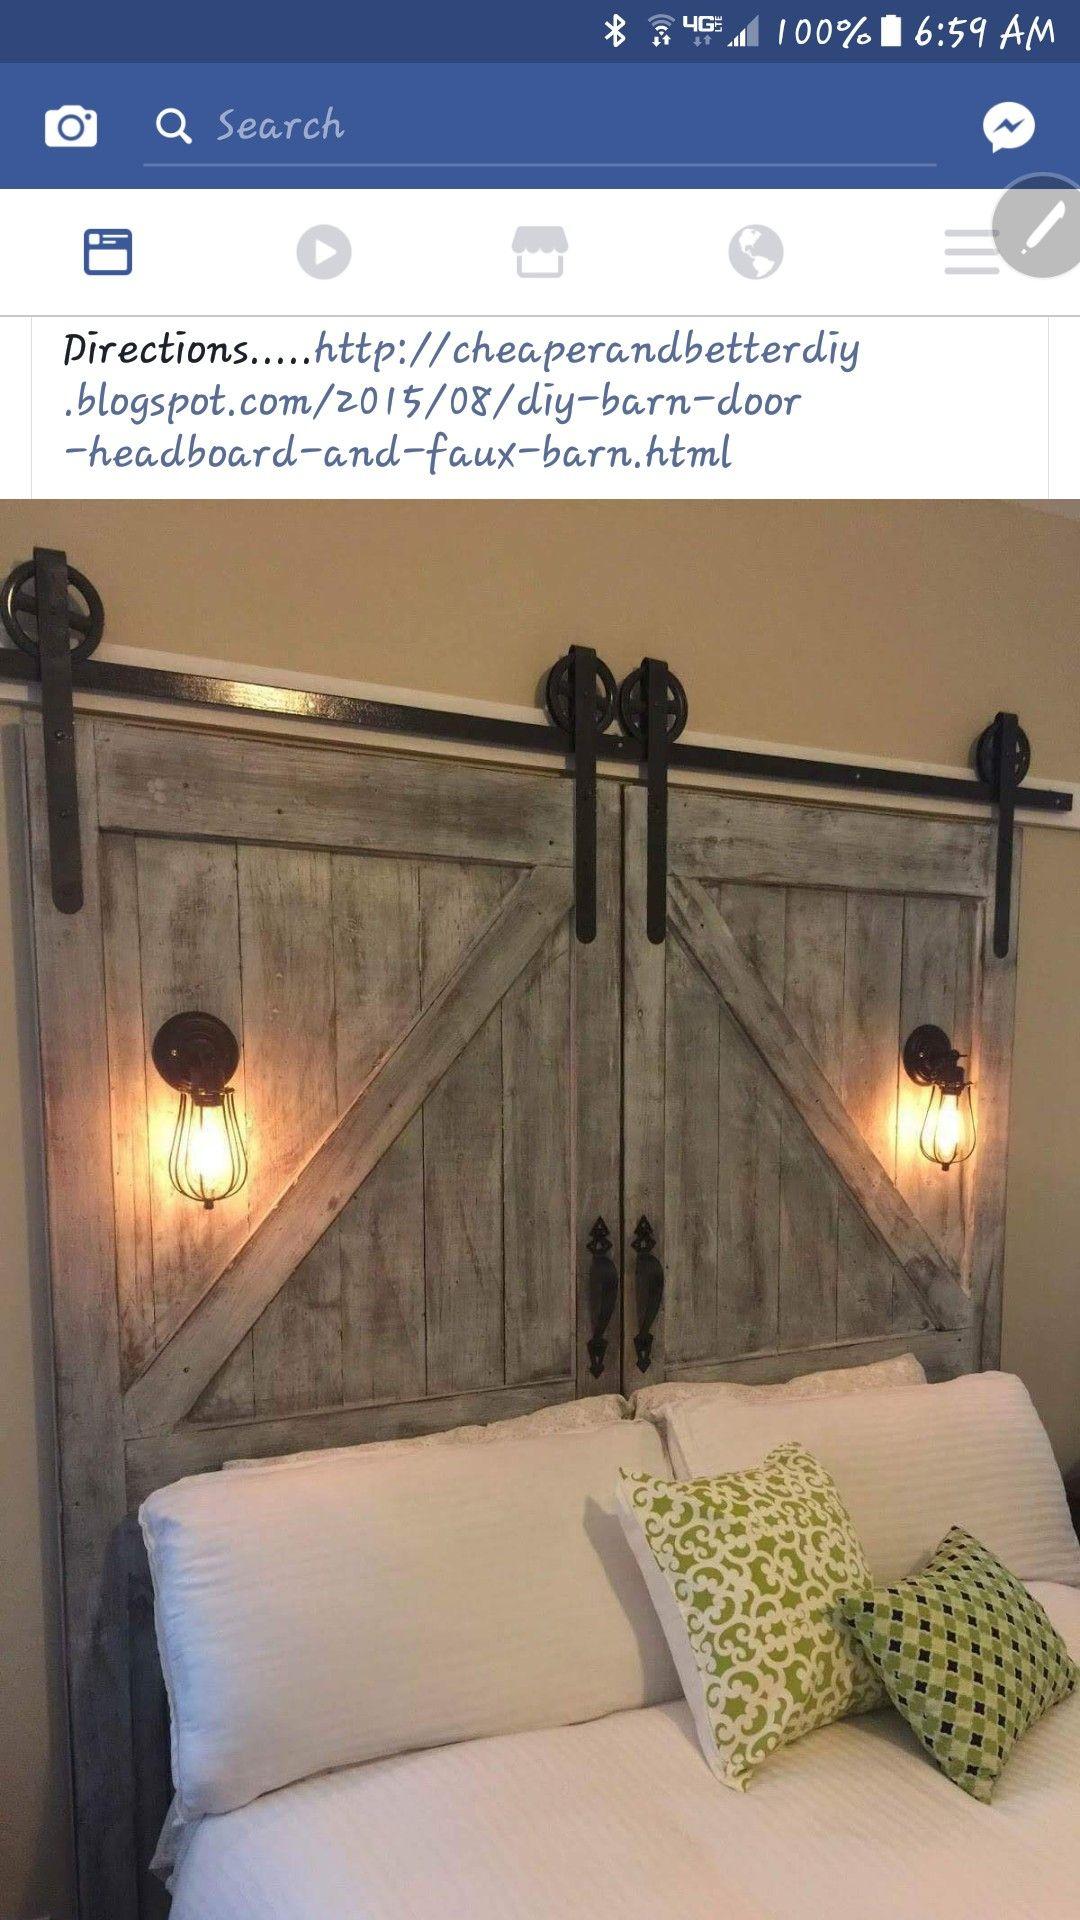 Tete De Lit Porte De Grange diy barndoor headboard | deco tete de lit, maison rustique